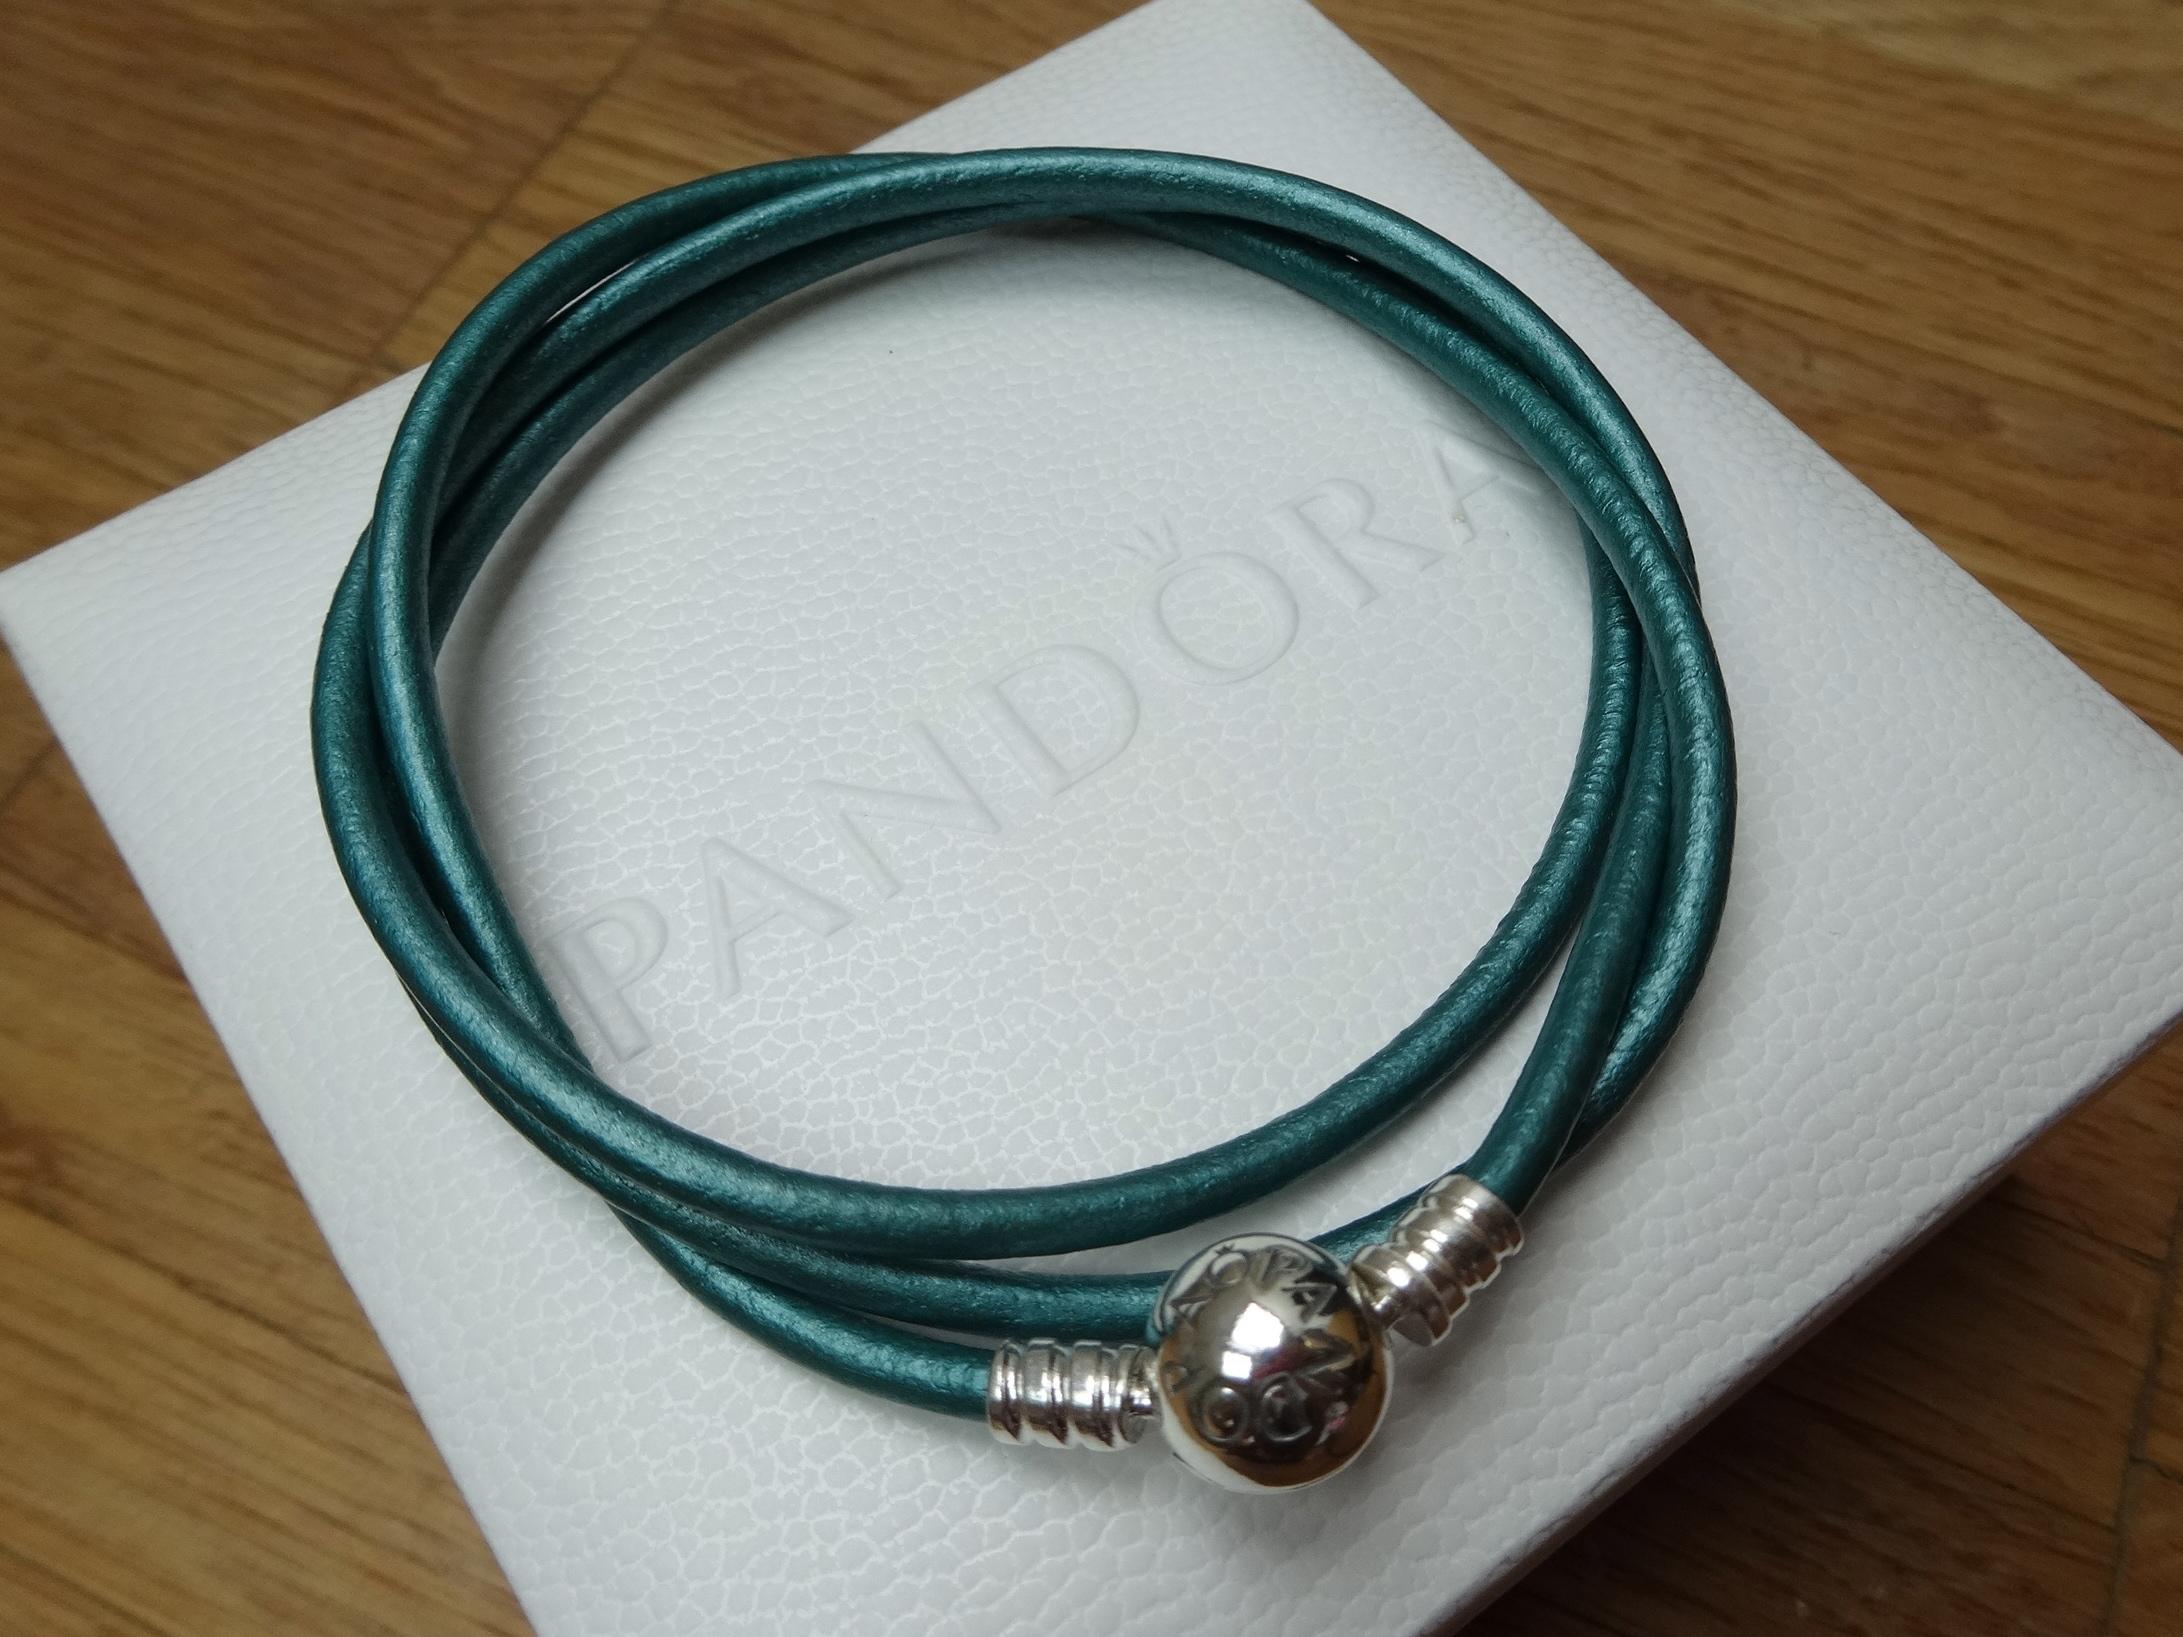 Giveaway - Pandora wrap bracelet